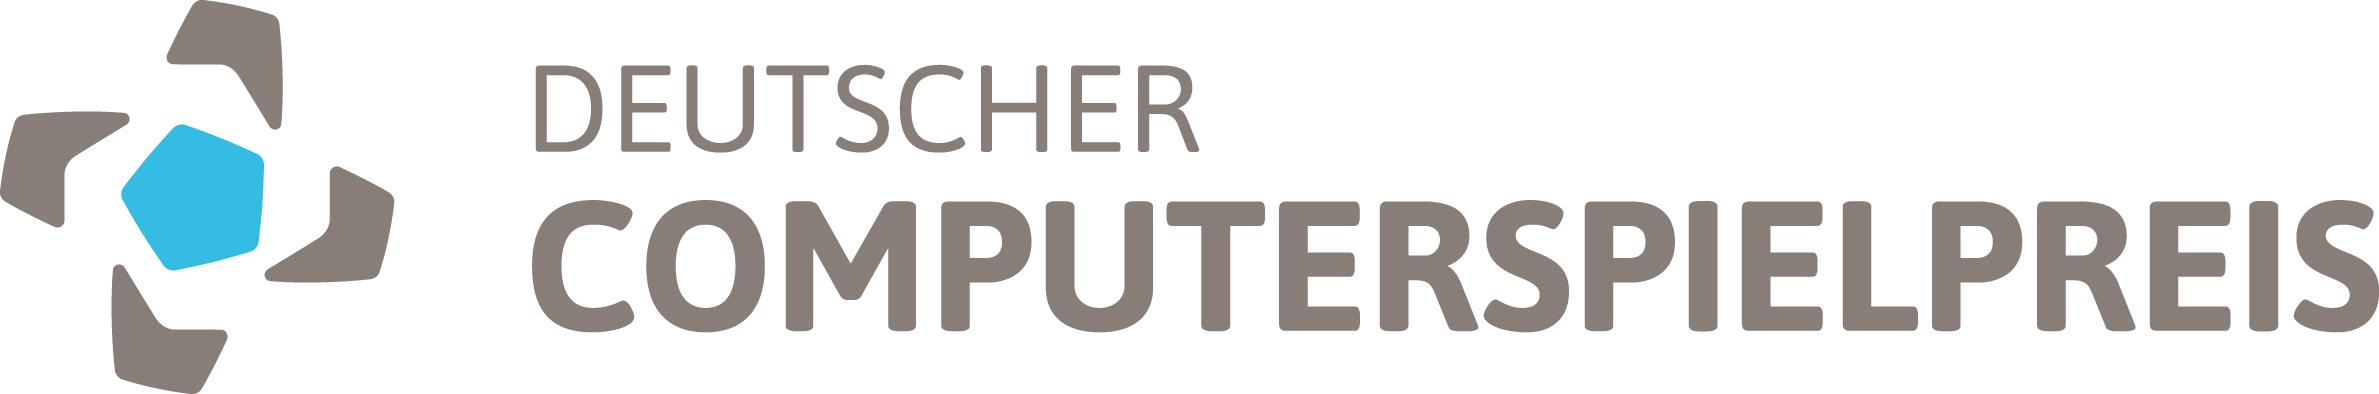 dcp logo 150101 big